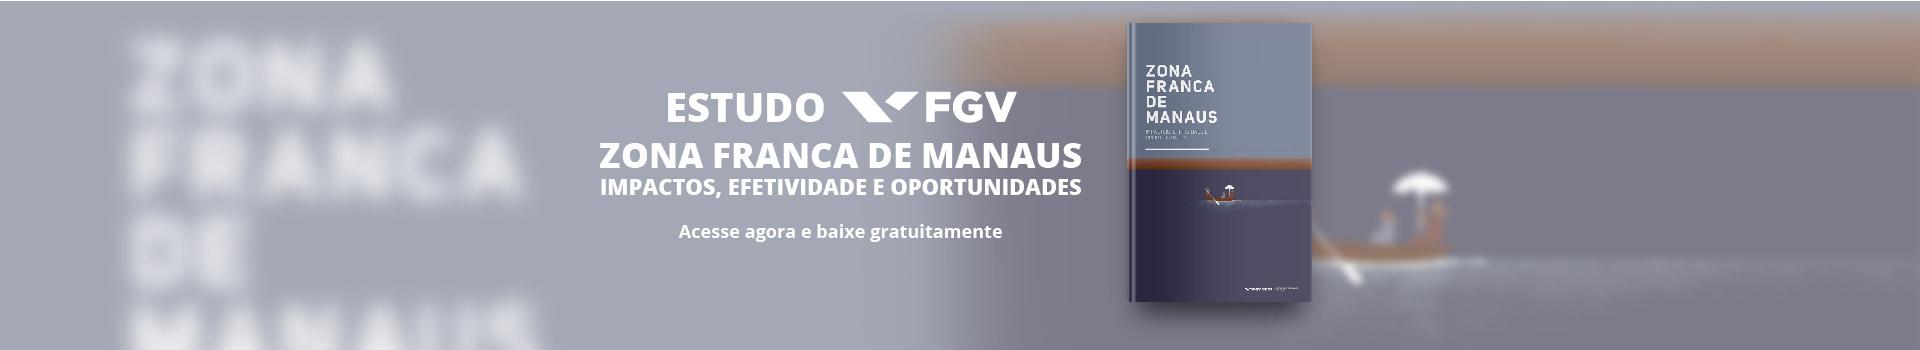 FGV_3-01